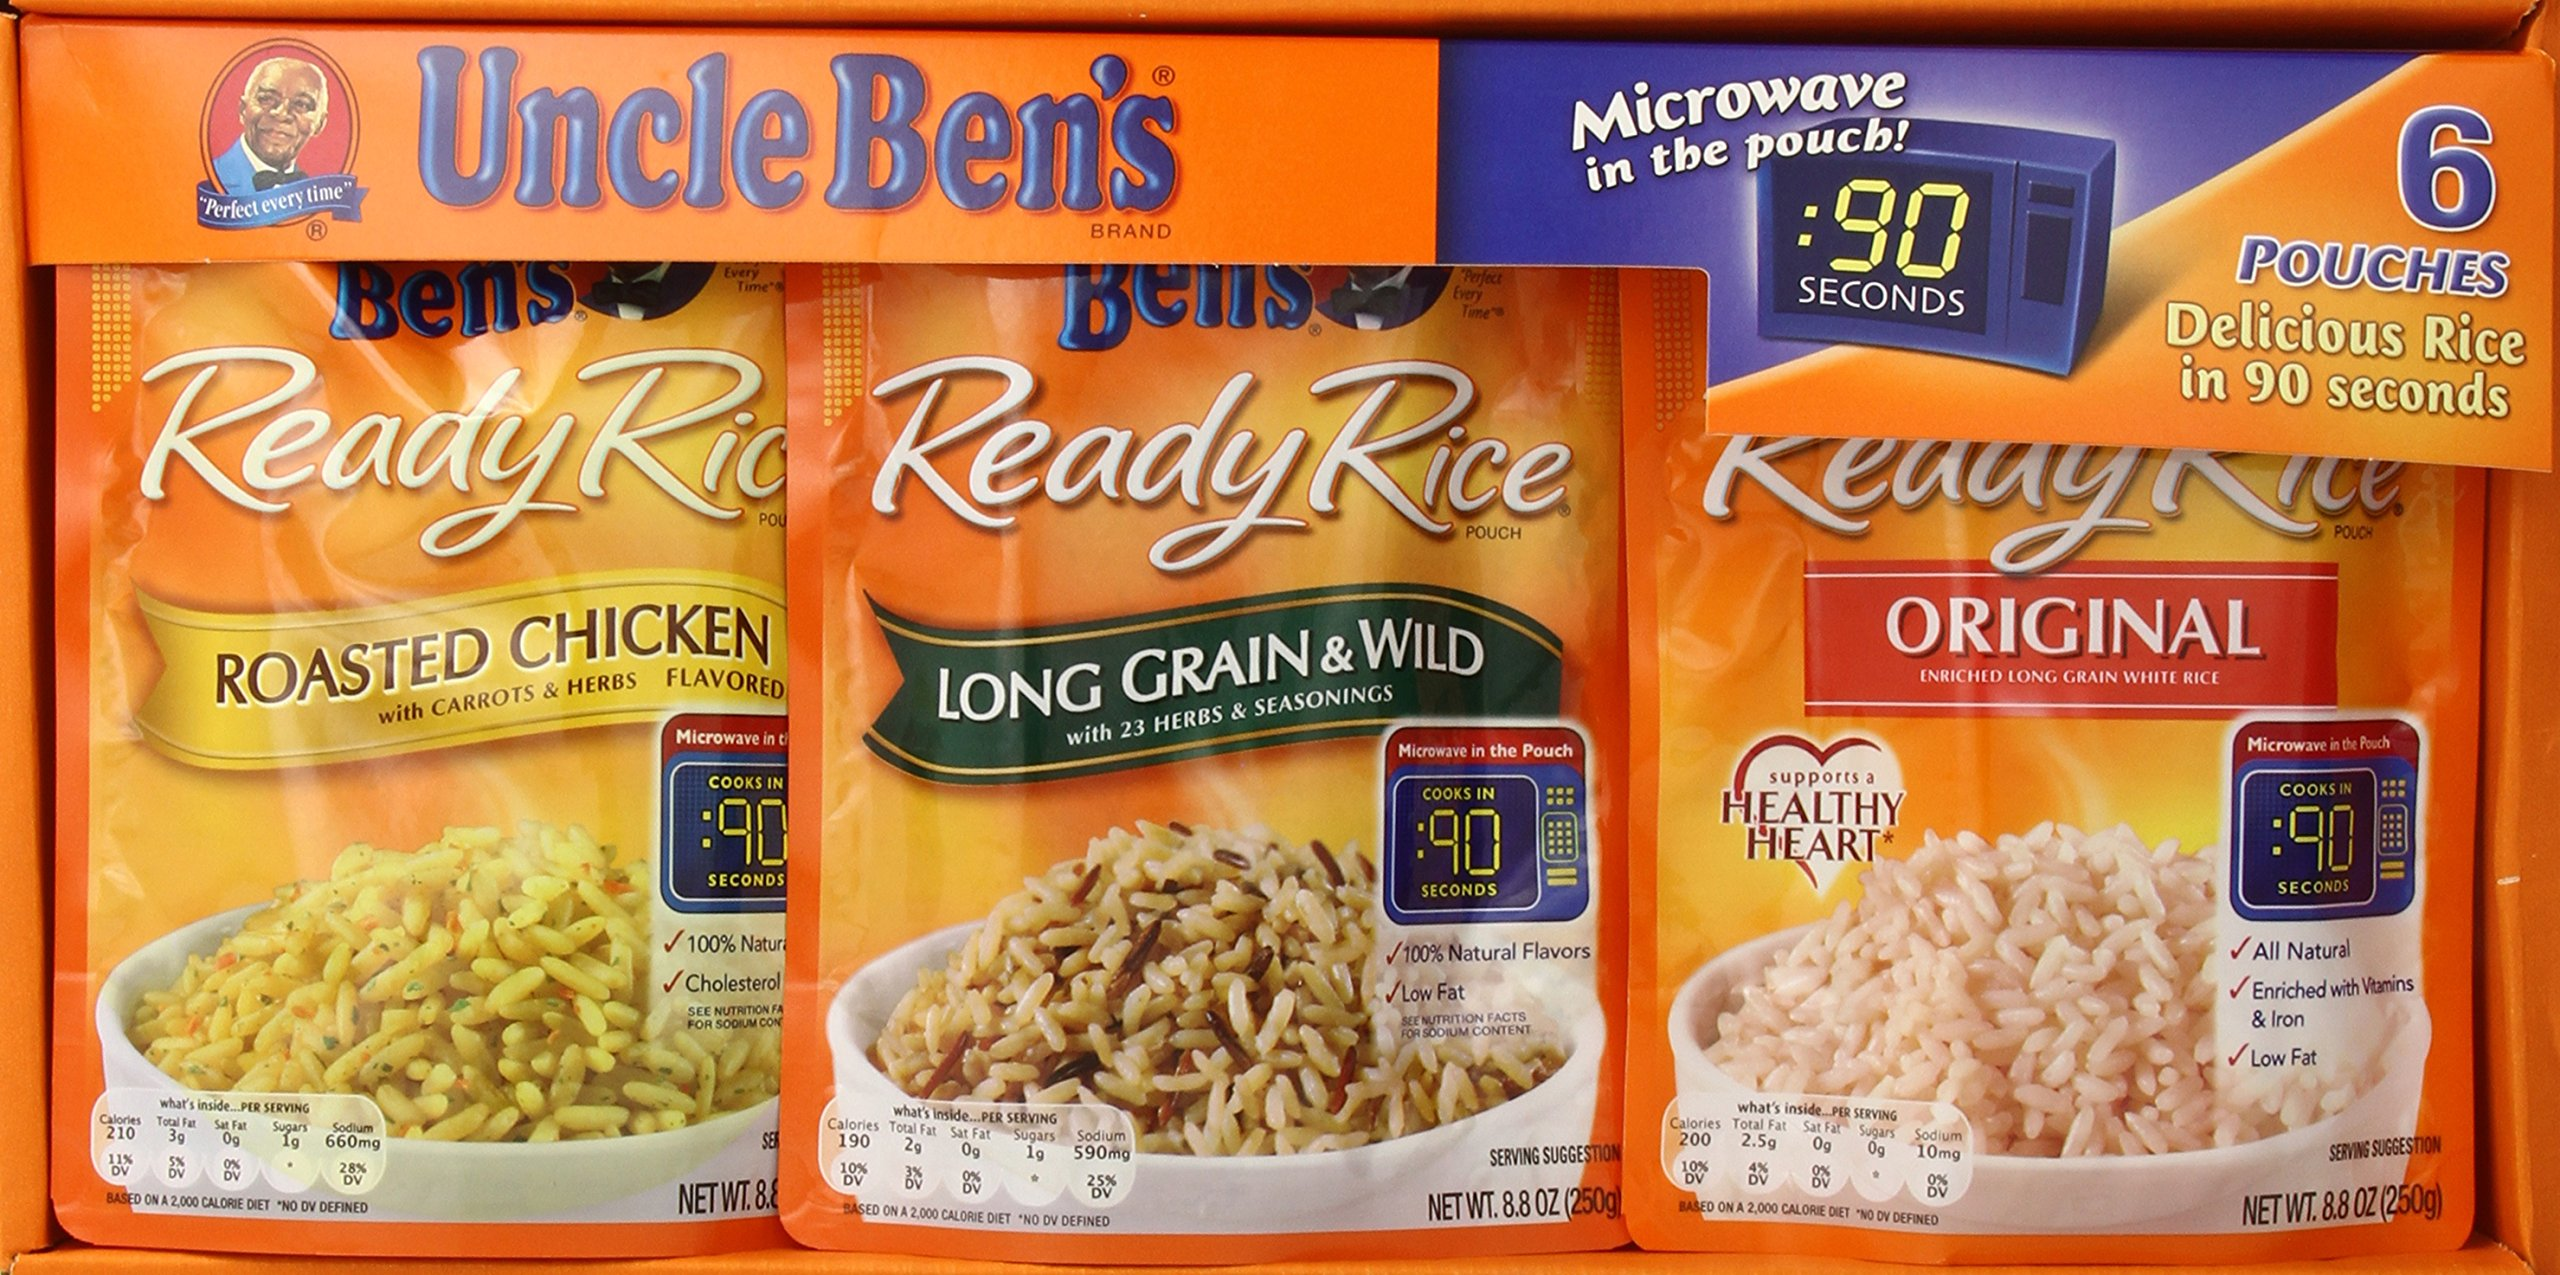 Amazon.com : Uncle Ben's Ready Rice Chicken Whole Grain